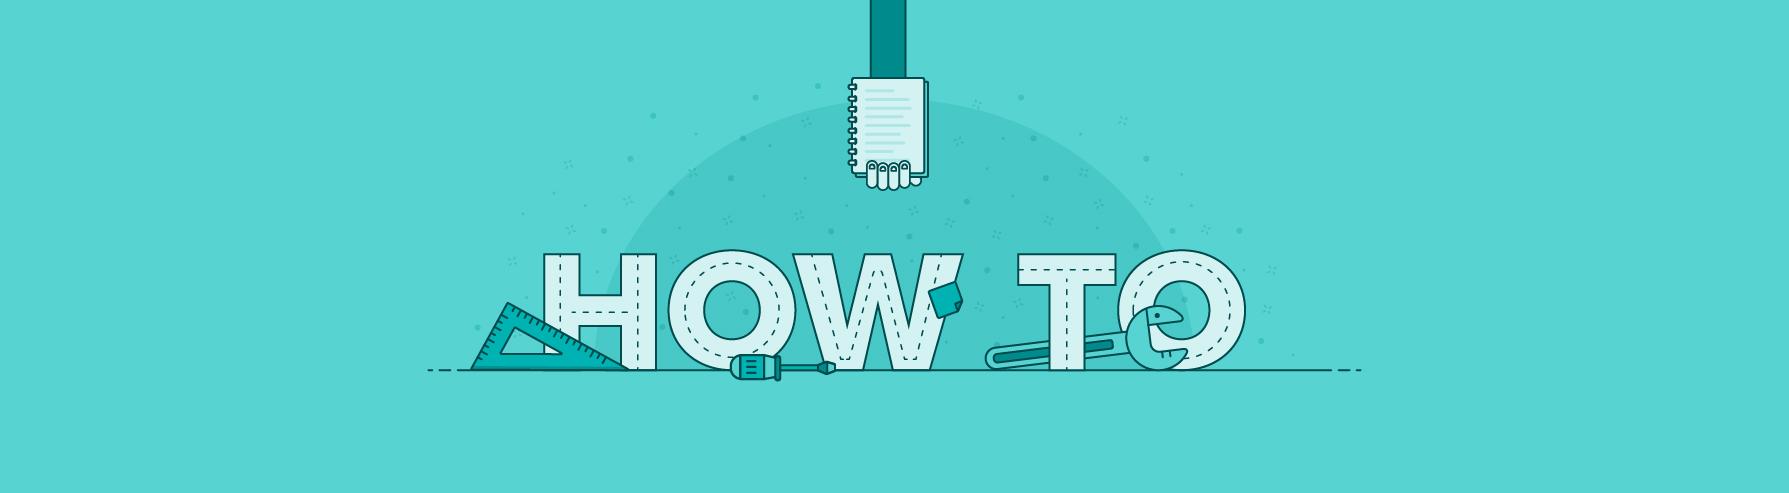 How can I edit my invoice in Teamleader? : Teamleader